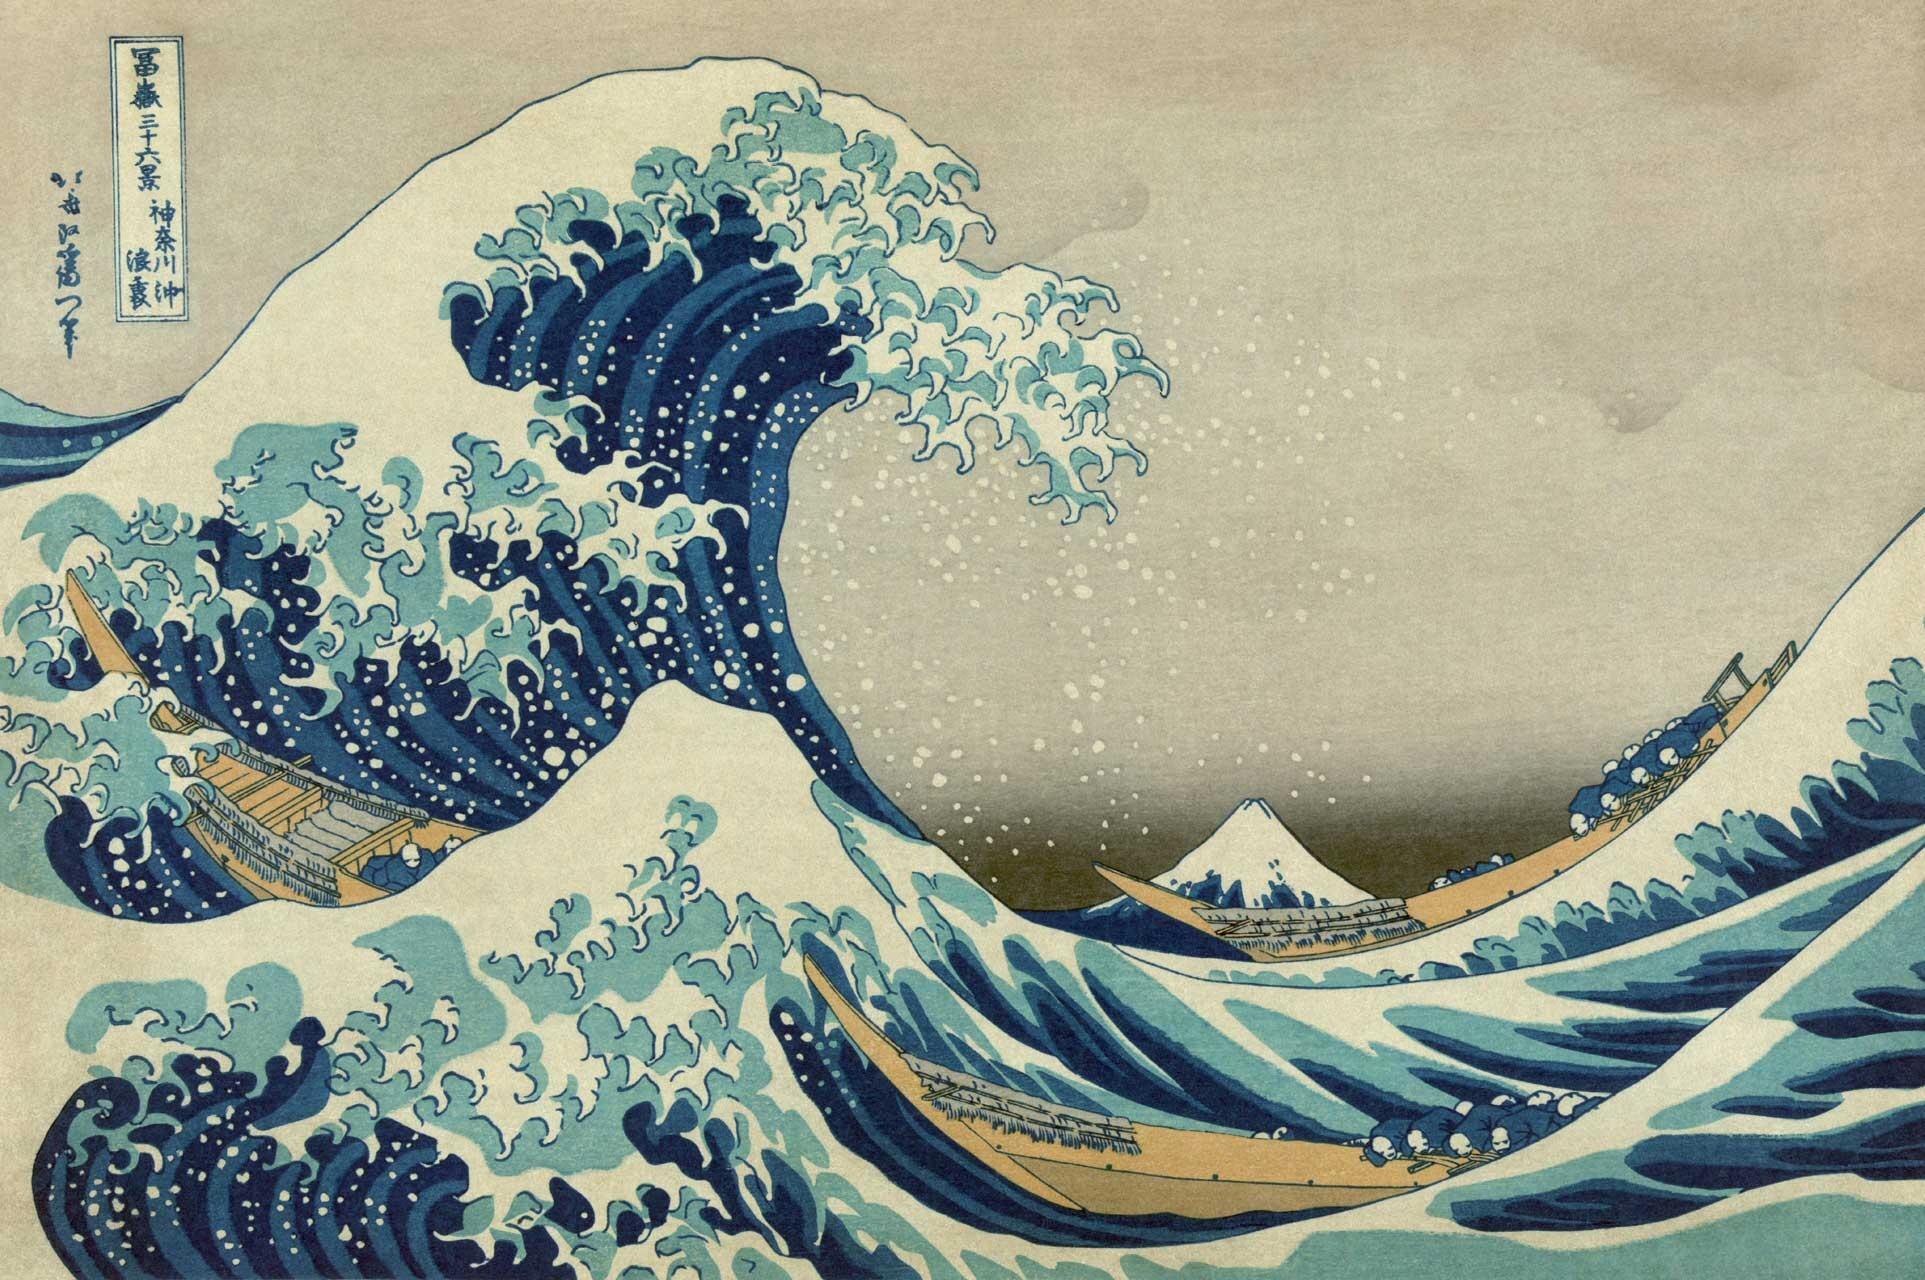 Hokusai Katsushika Wallpapers Computer Art Wallpaper 1925x1280